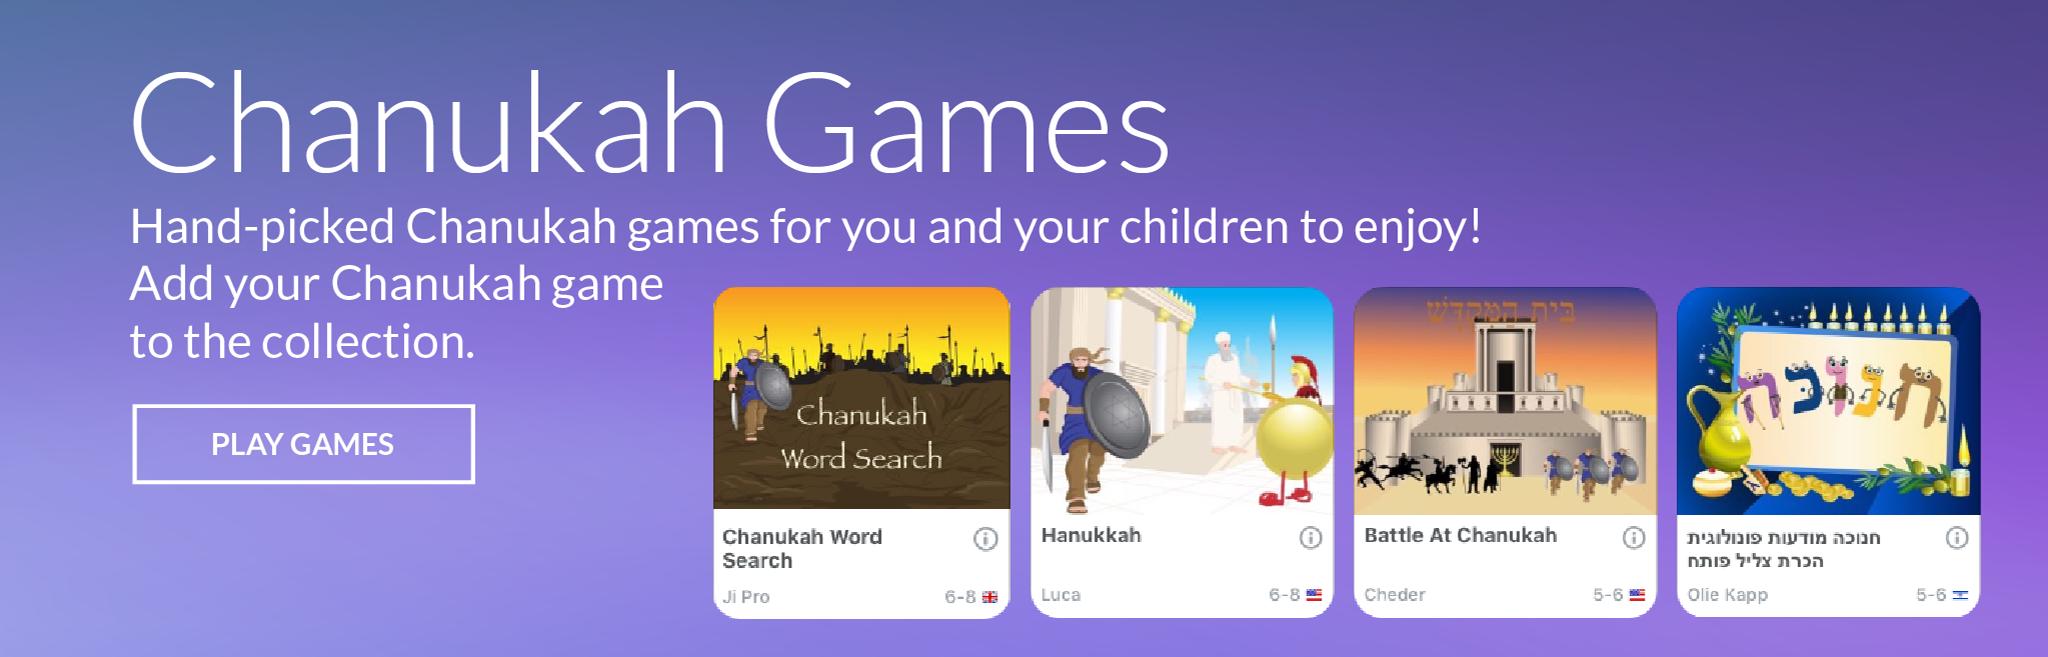 Chanukah Games